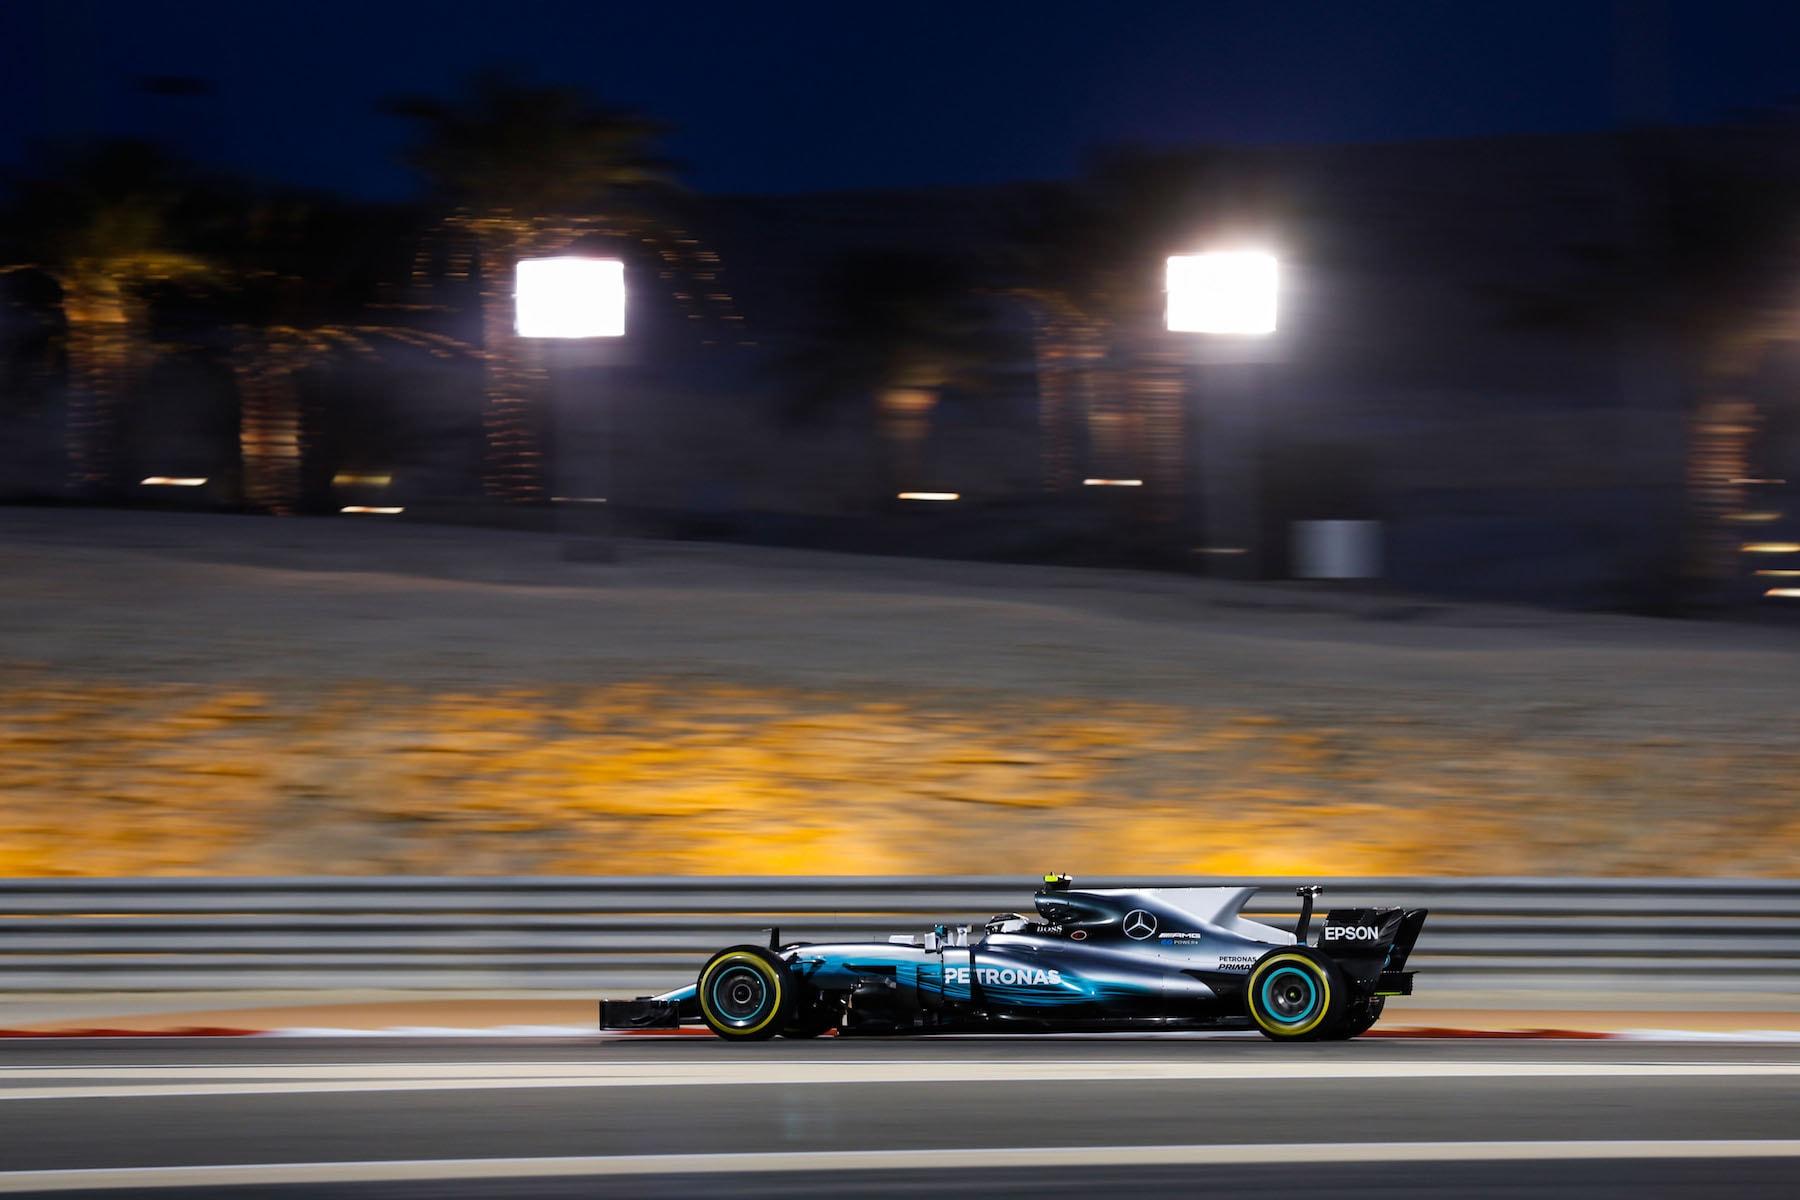 H 2017 Valtteri Bottas   Mercedes W08   2017 Bahrain GP P3 1 copy.jpg